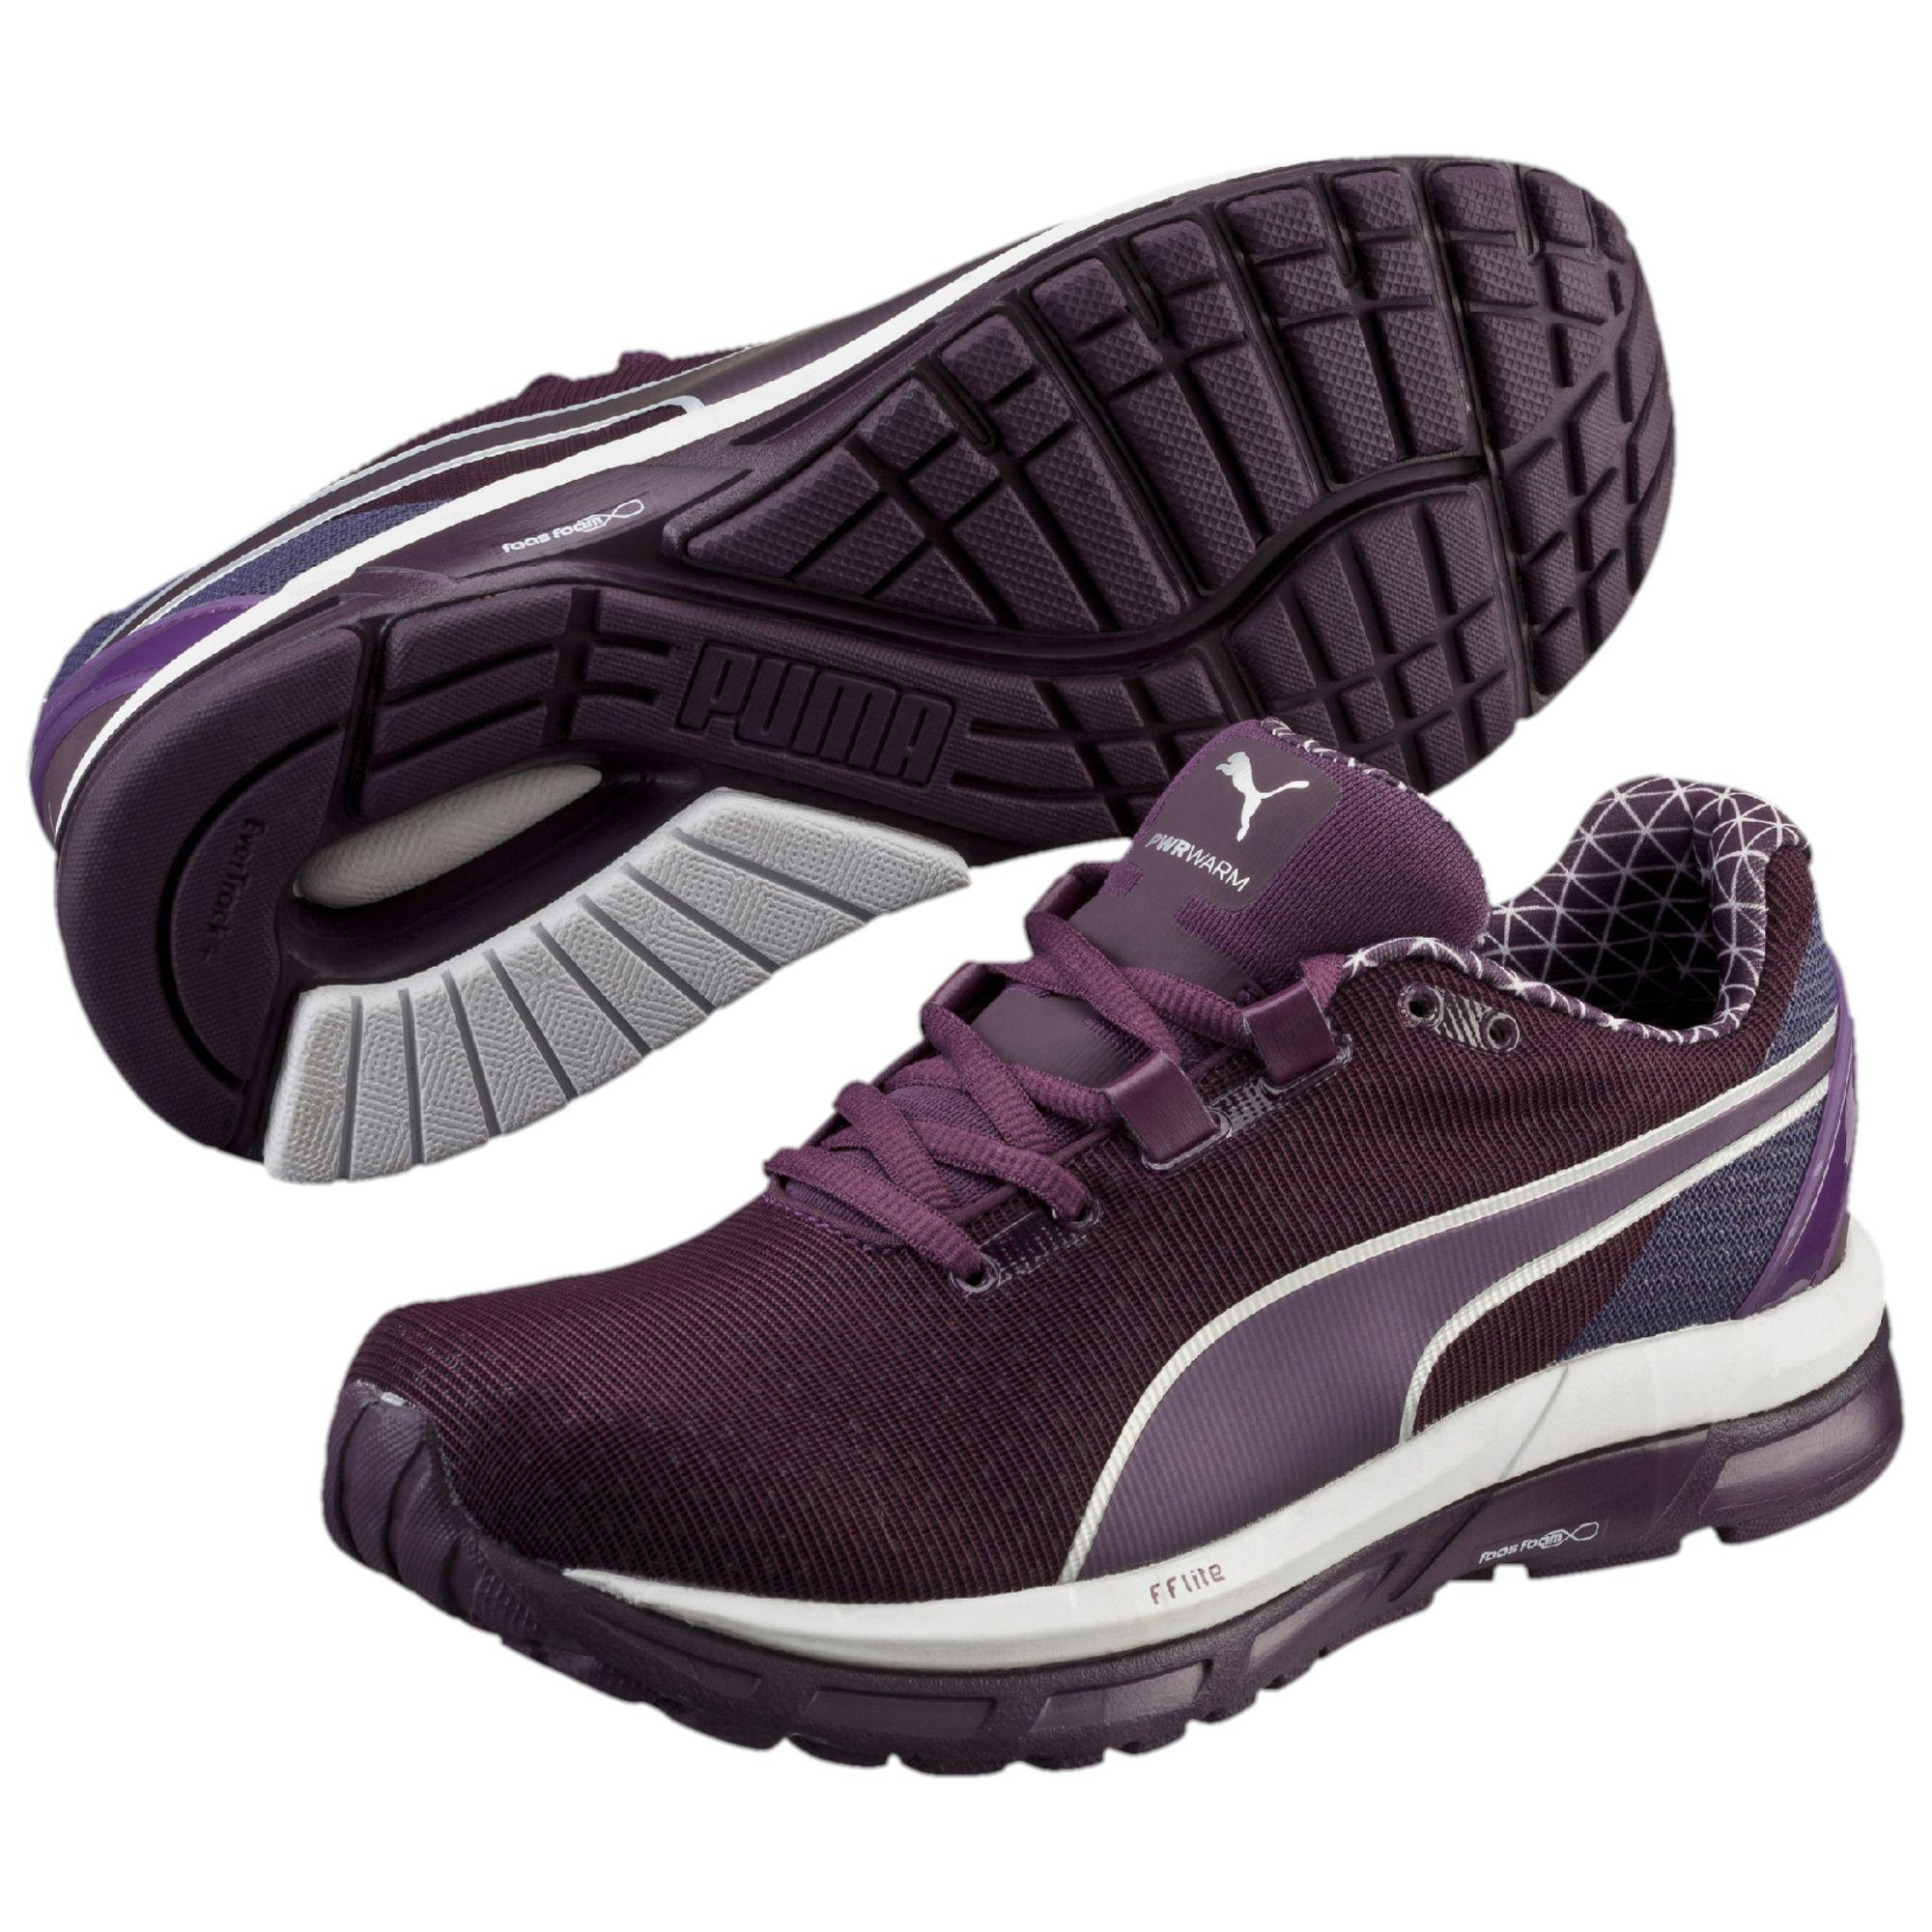 ... PUMA-FAAS-600-S-v2-PWRWARM-Women-s- PUMA Faas 300 V2 Mens Running Shoes  ...